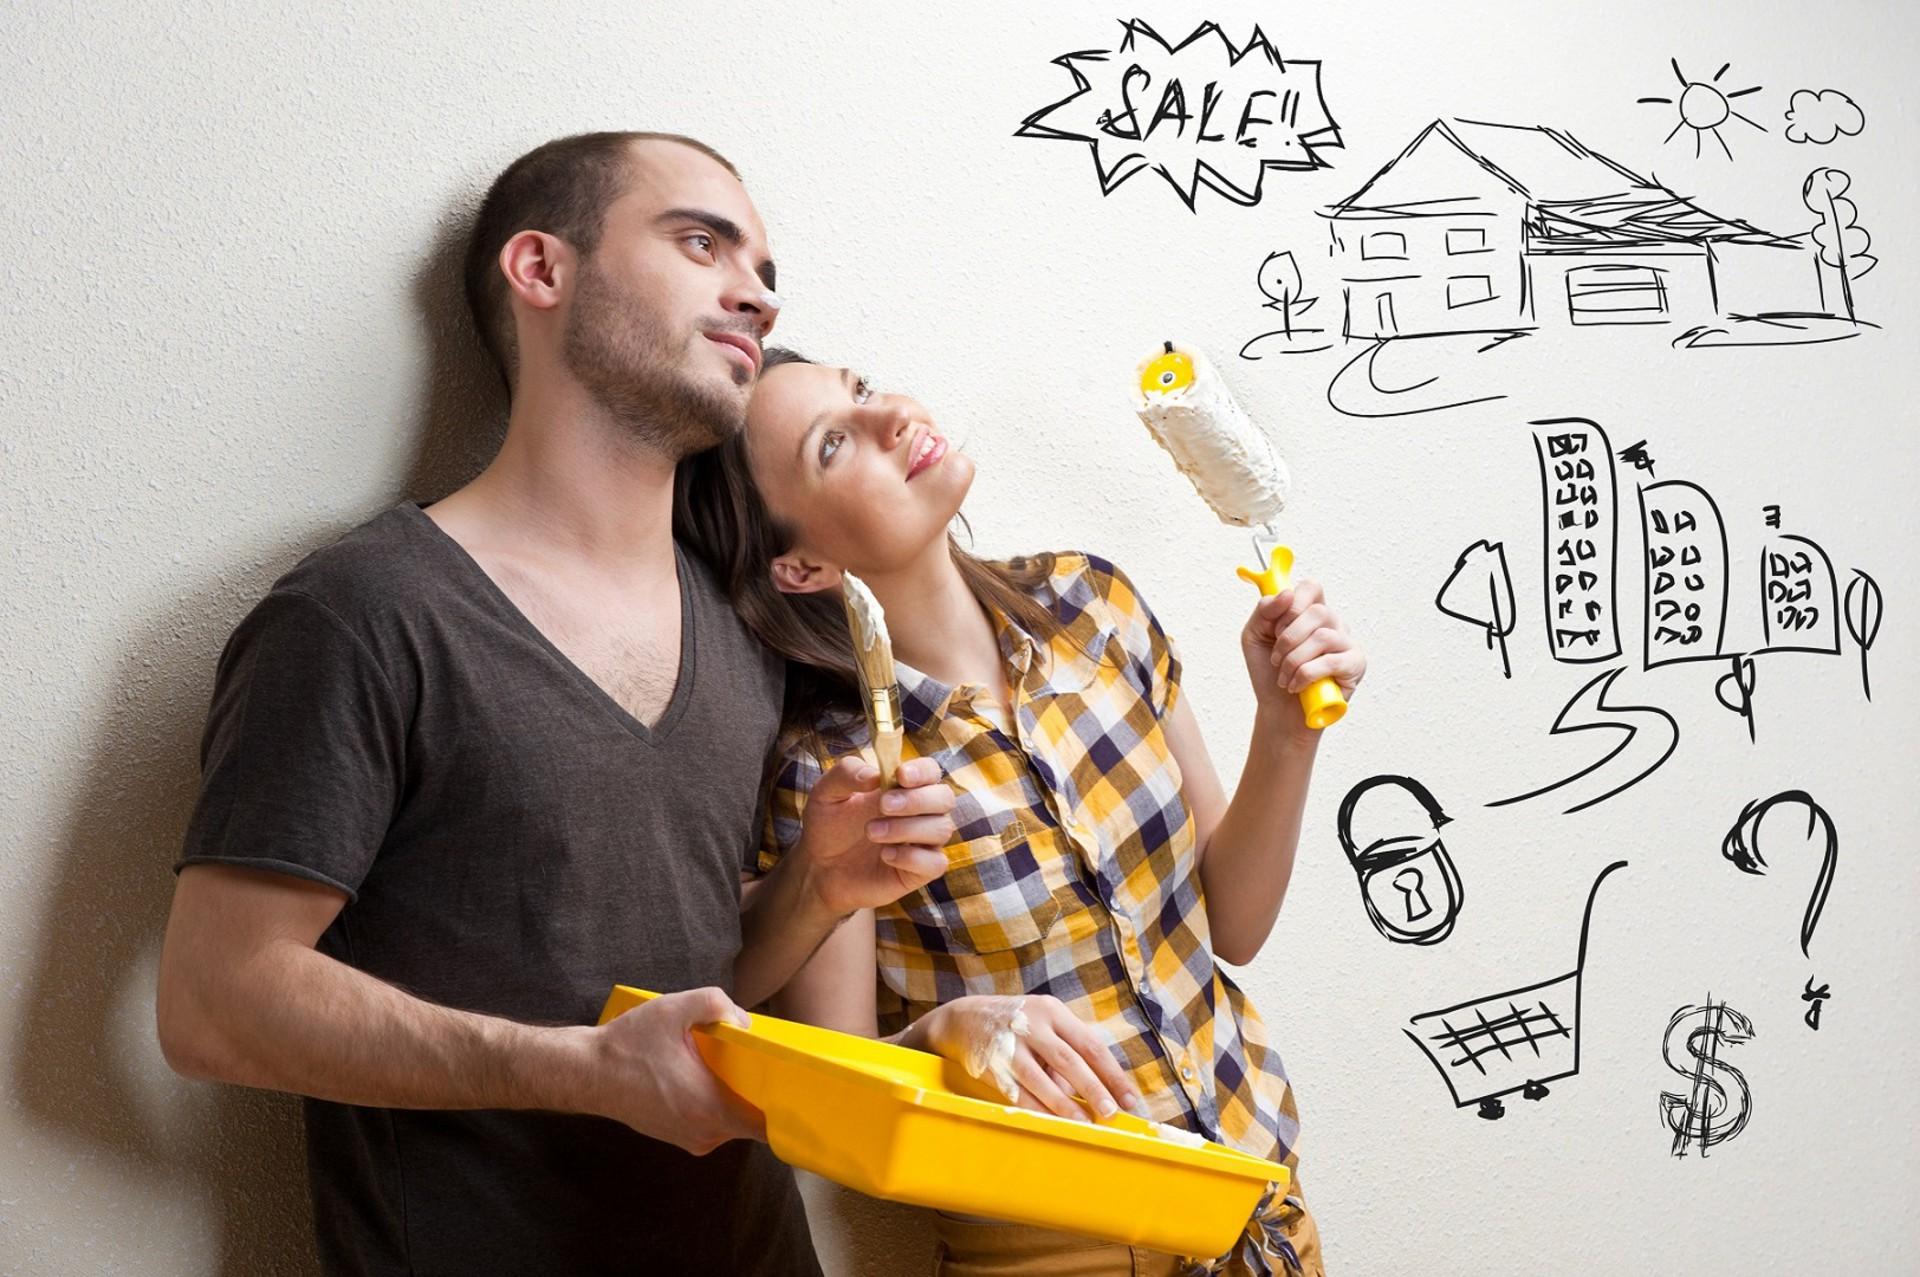 assurance solde restant d pr voyance axa assurances luxembourg. Black Bedroom Furniture Sets. Home Design Ideas